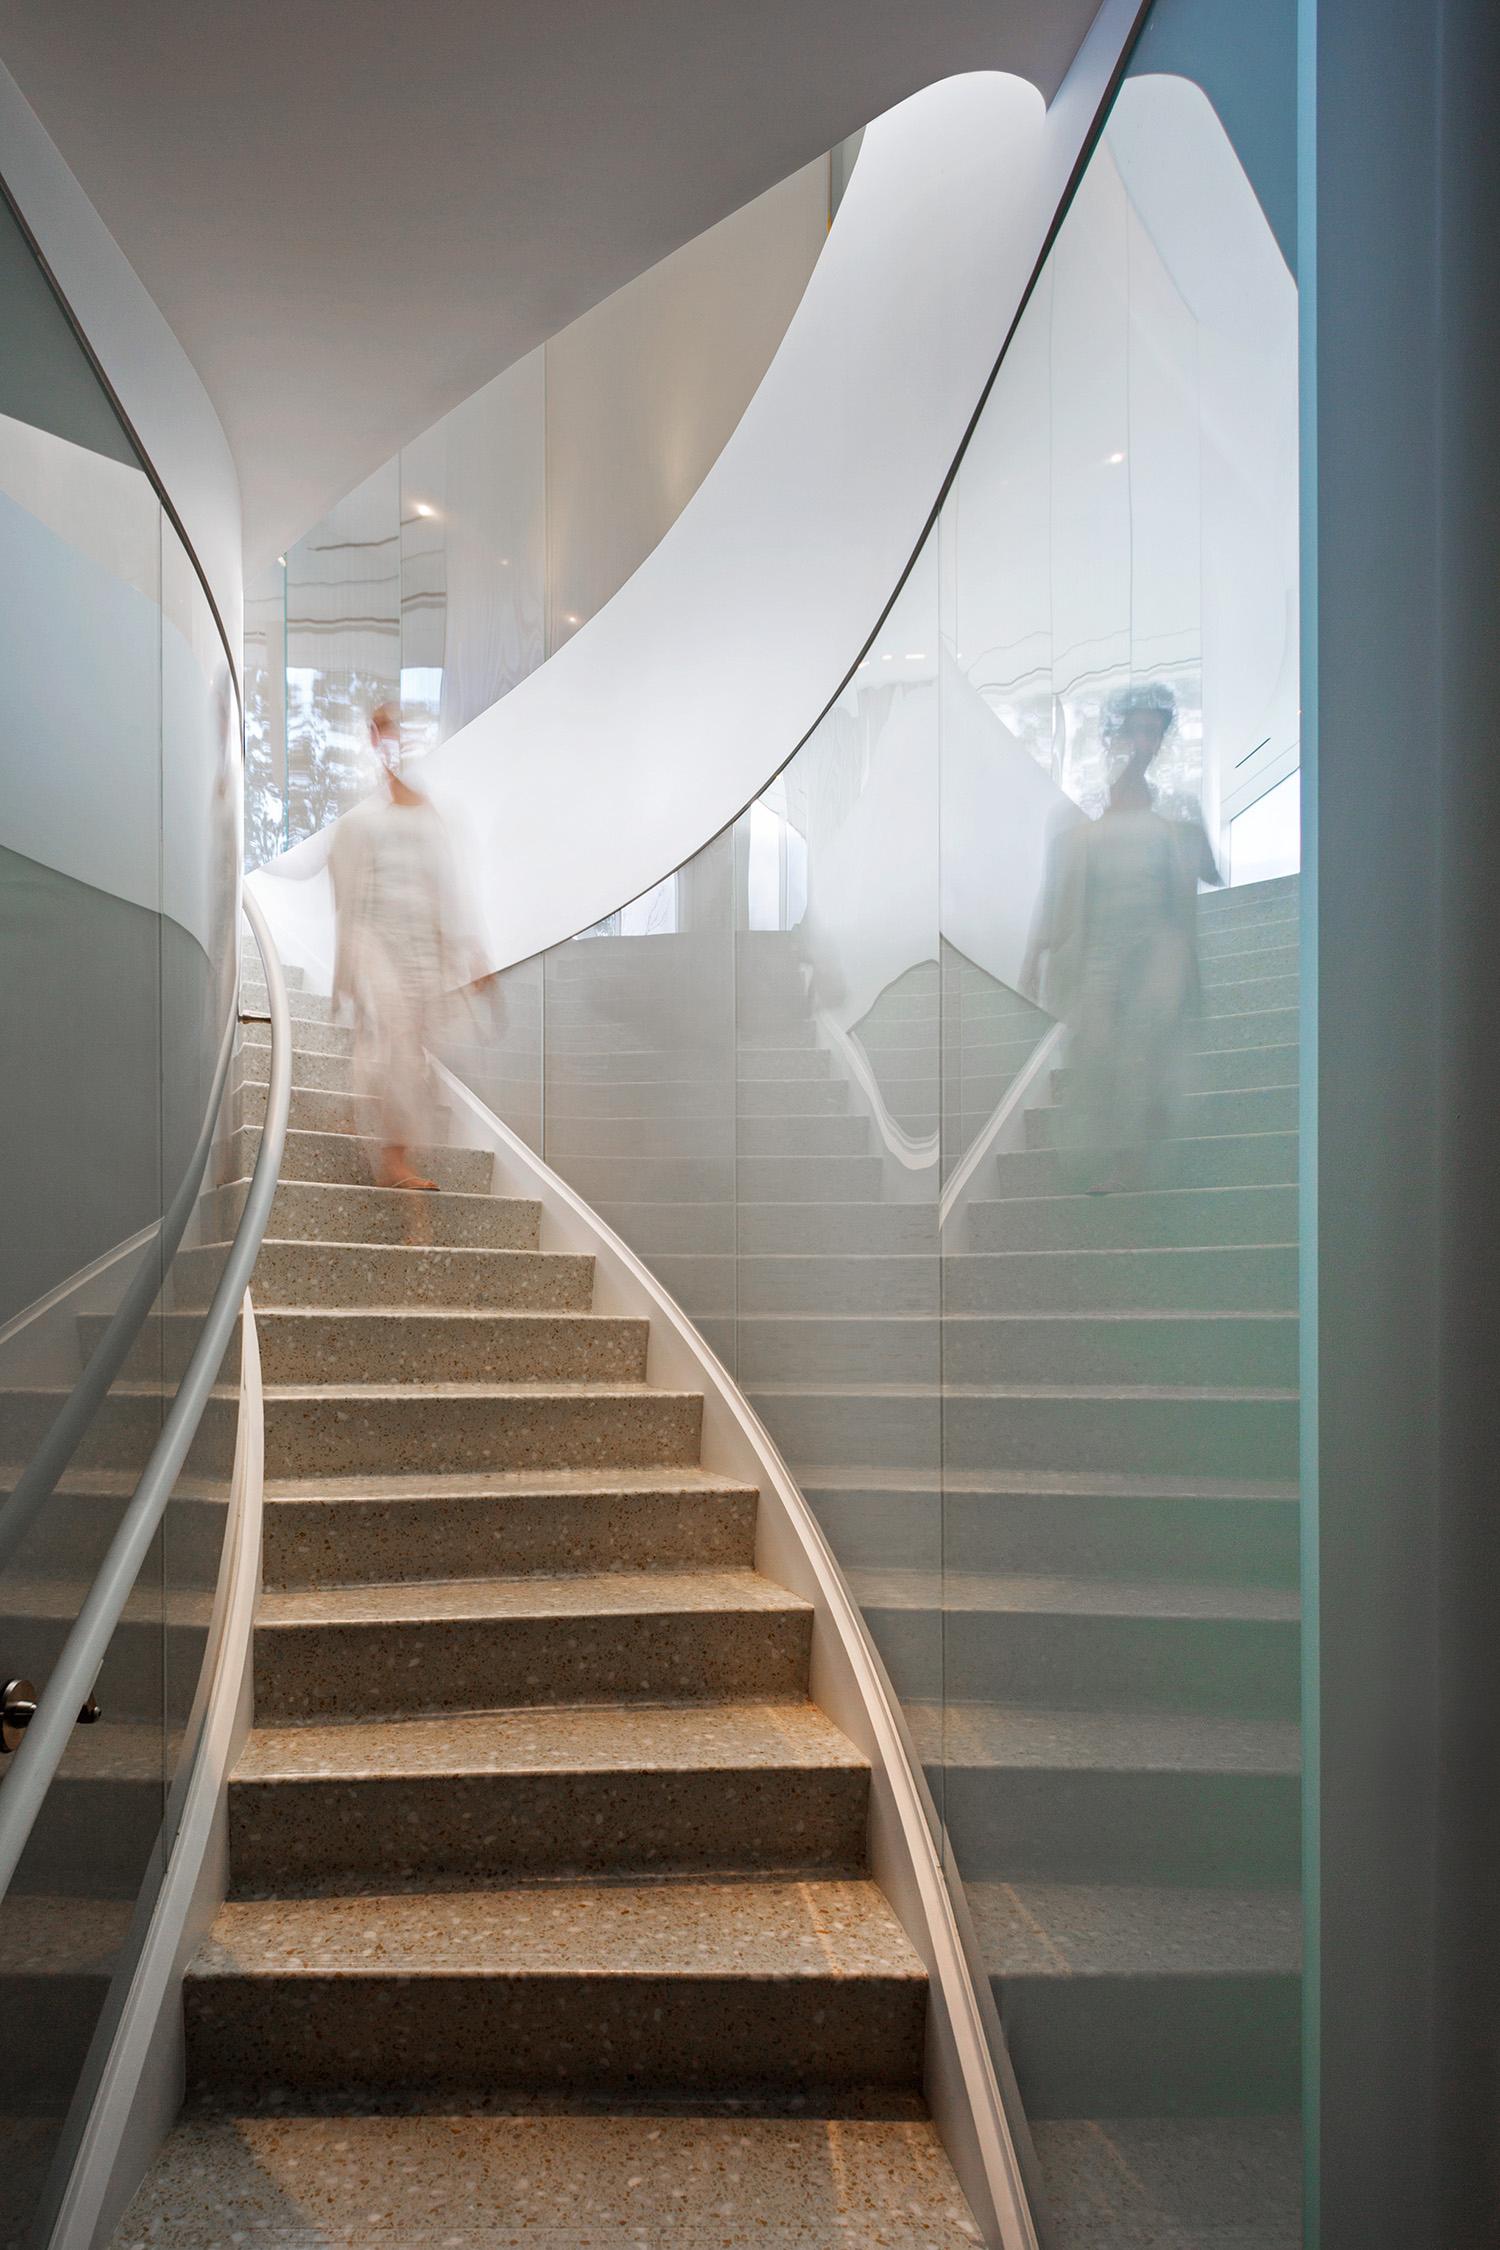 Barbara Silverman / Art Collector